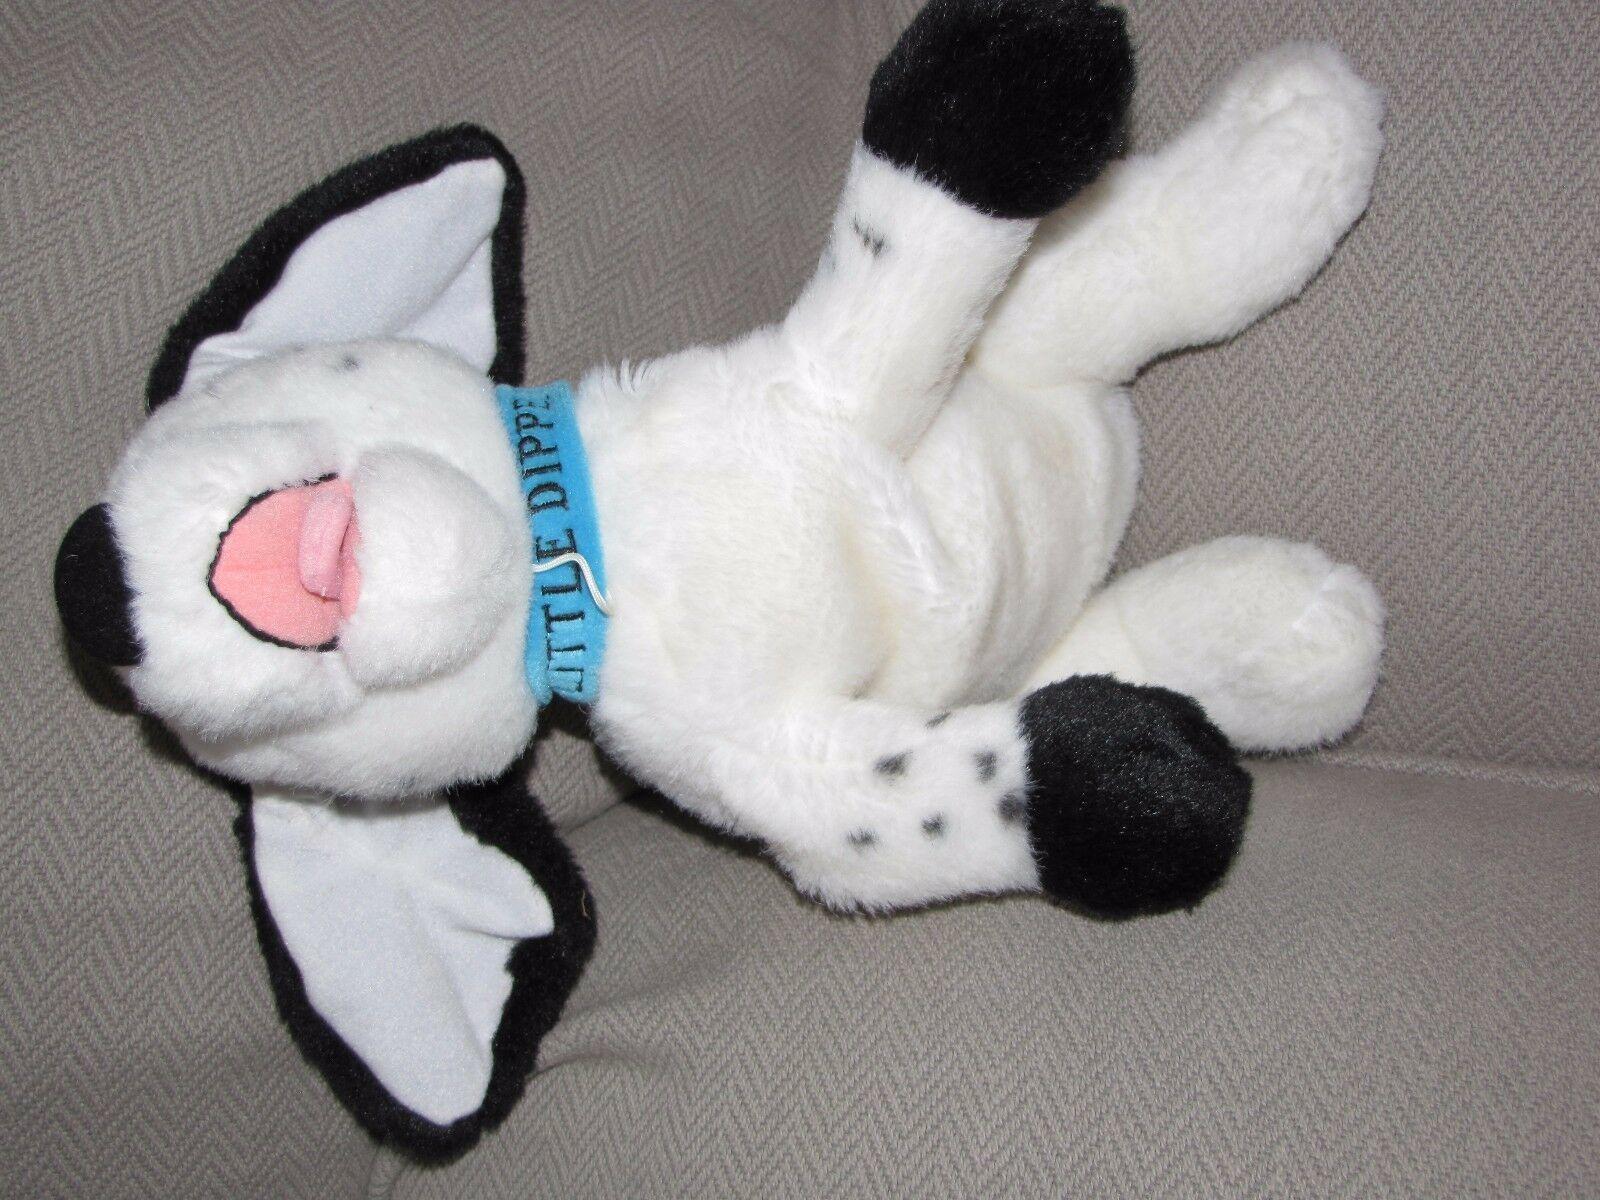 DISNEY STUFFED PLUSH 101 DALMATIANS DALMATIONS LITTLE DIPPER DOG BLUE COLLAR